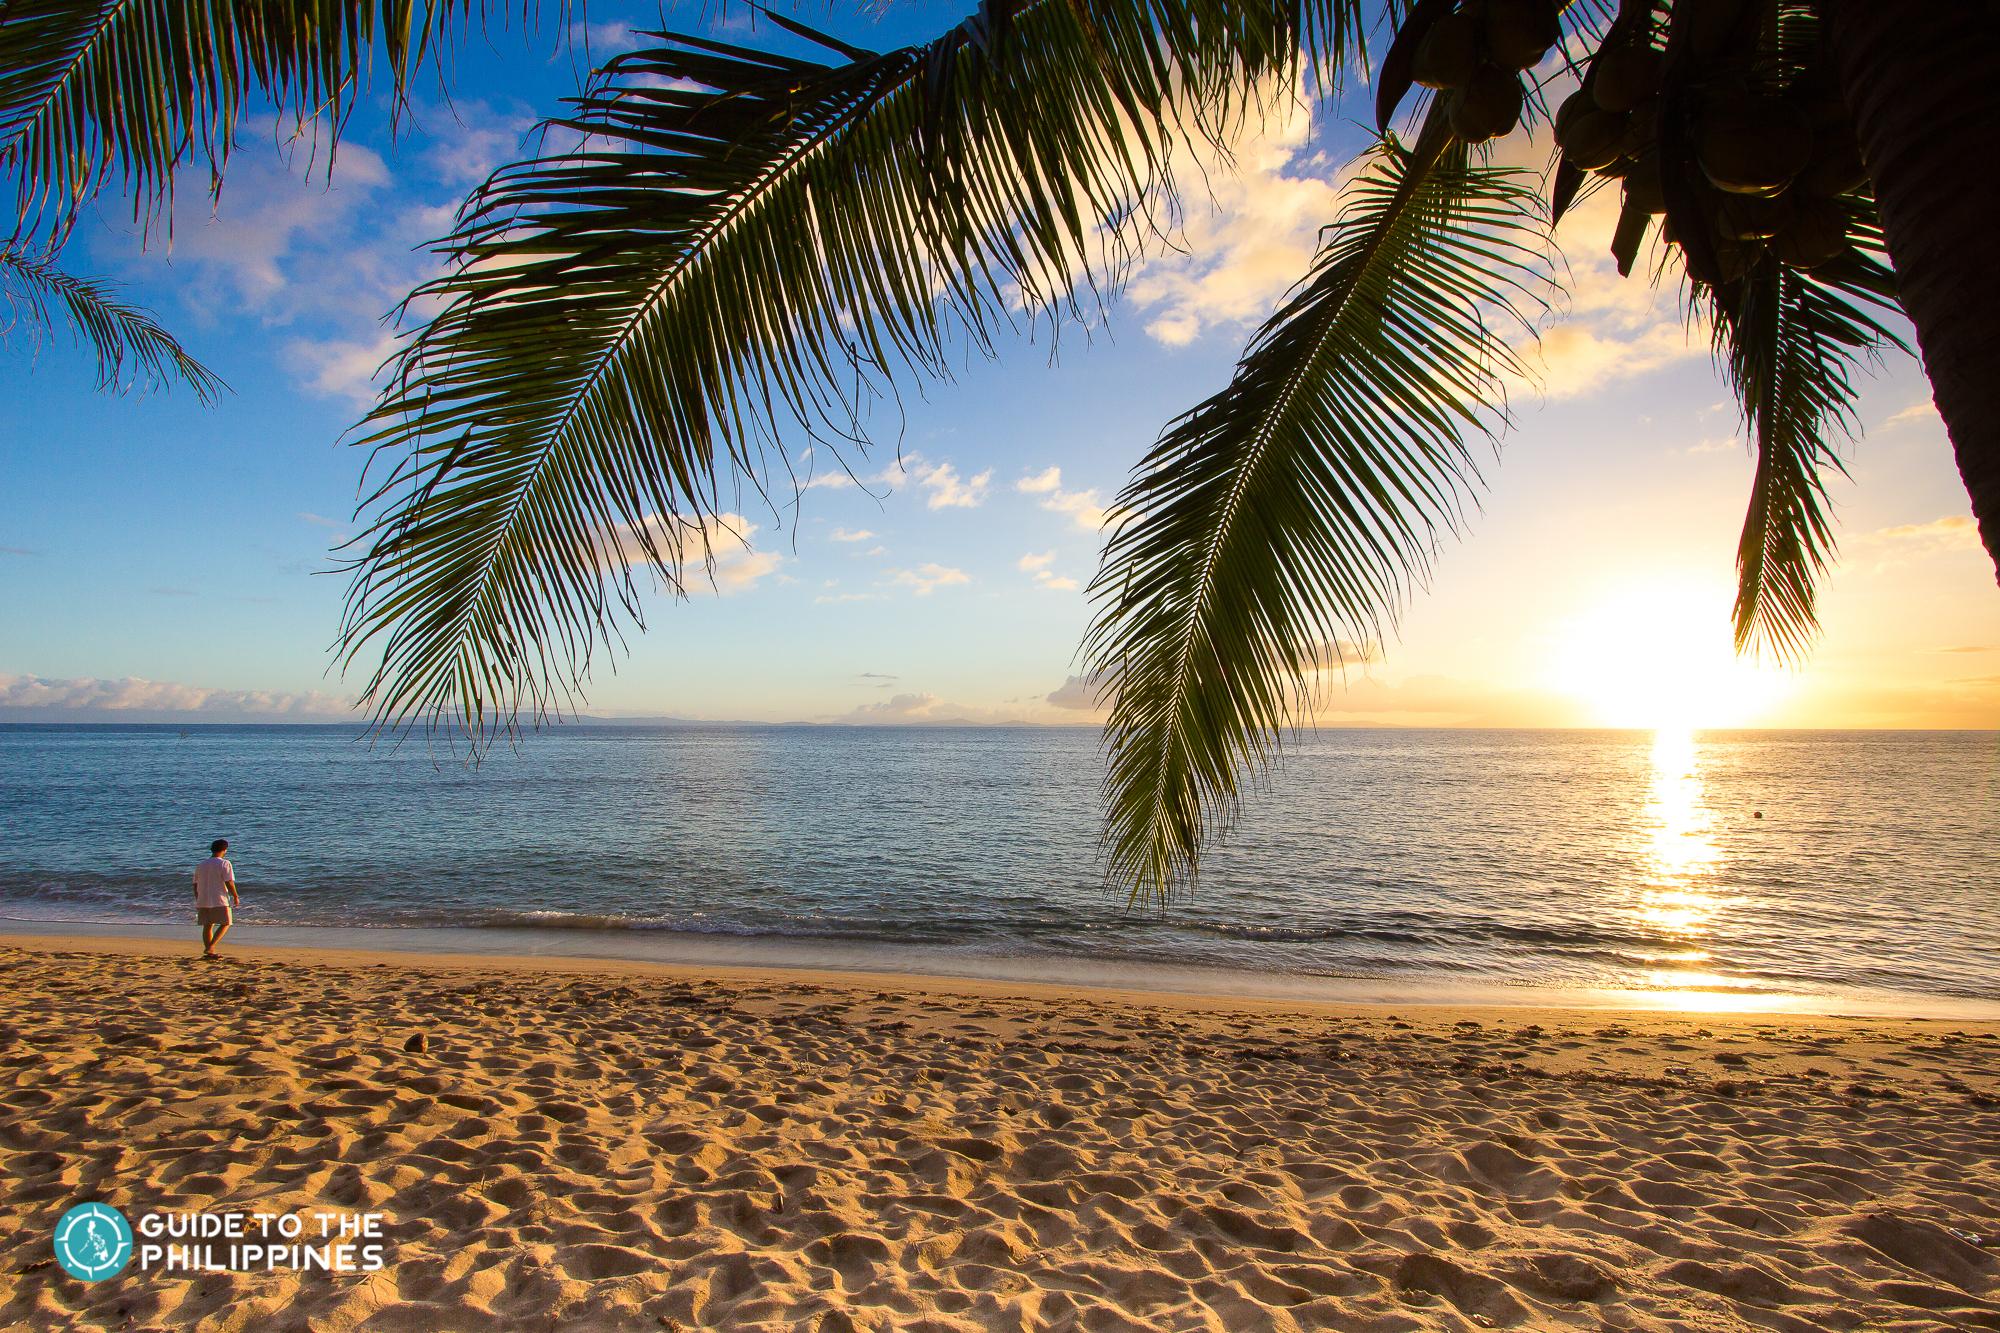 Virac Catanduanes Travel Guide: Pristine Beaches and Breathtaking Views